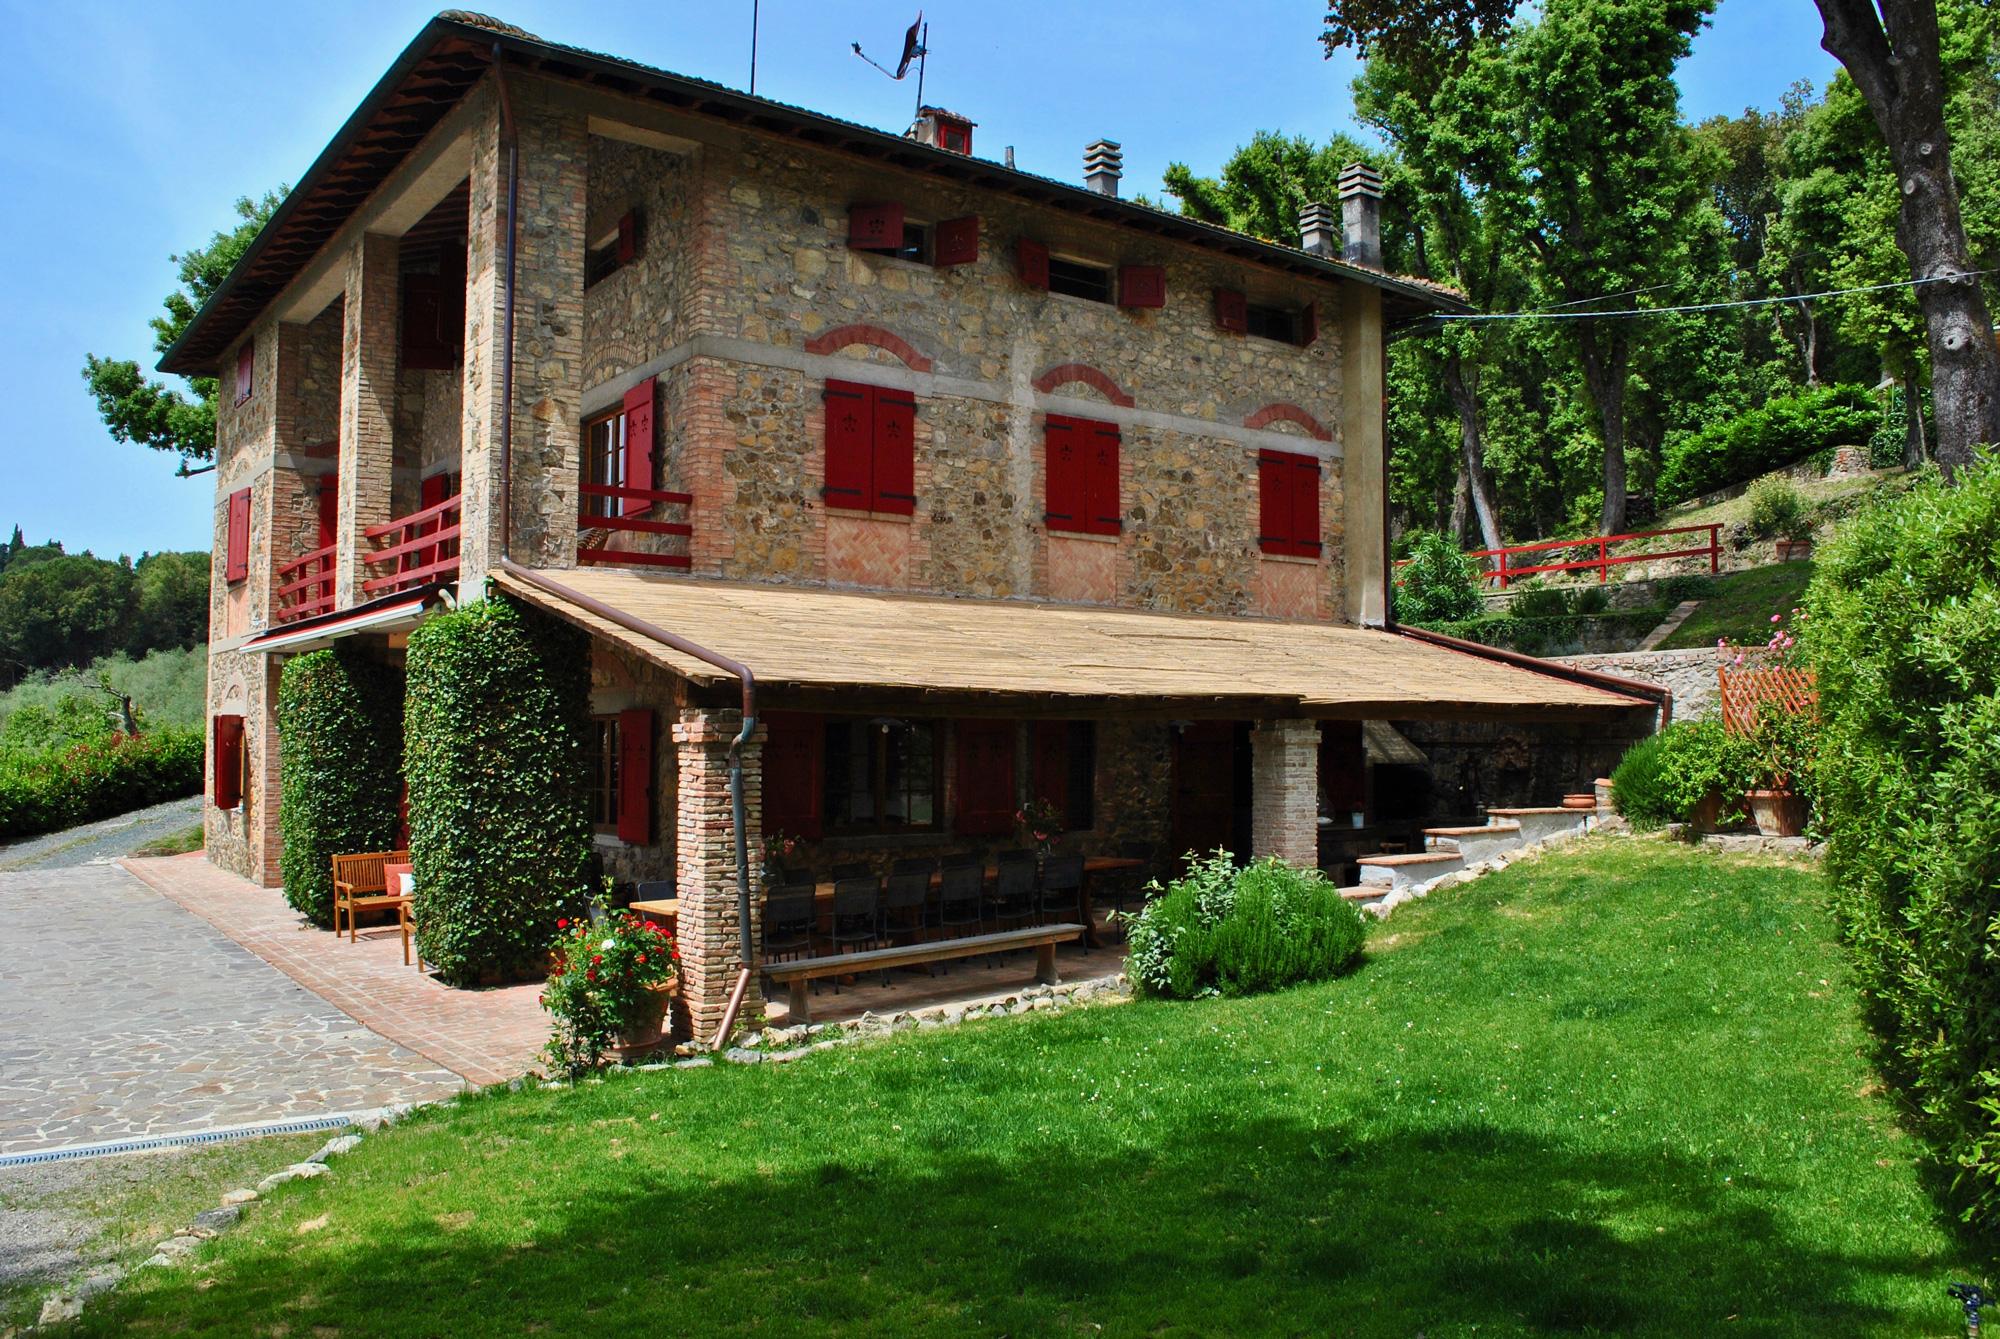 https://www.villalasciolta.it/wp-content/uploads/2016/02/villa-la-sciolta-tuscany5.jpg